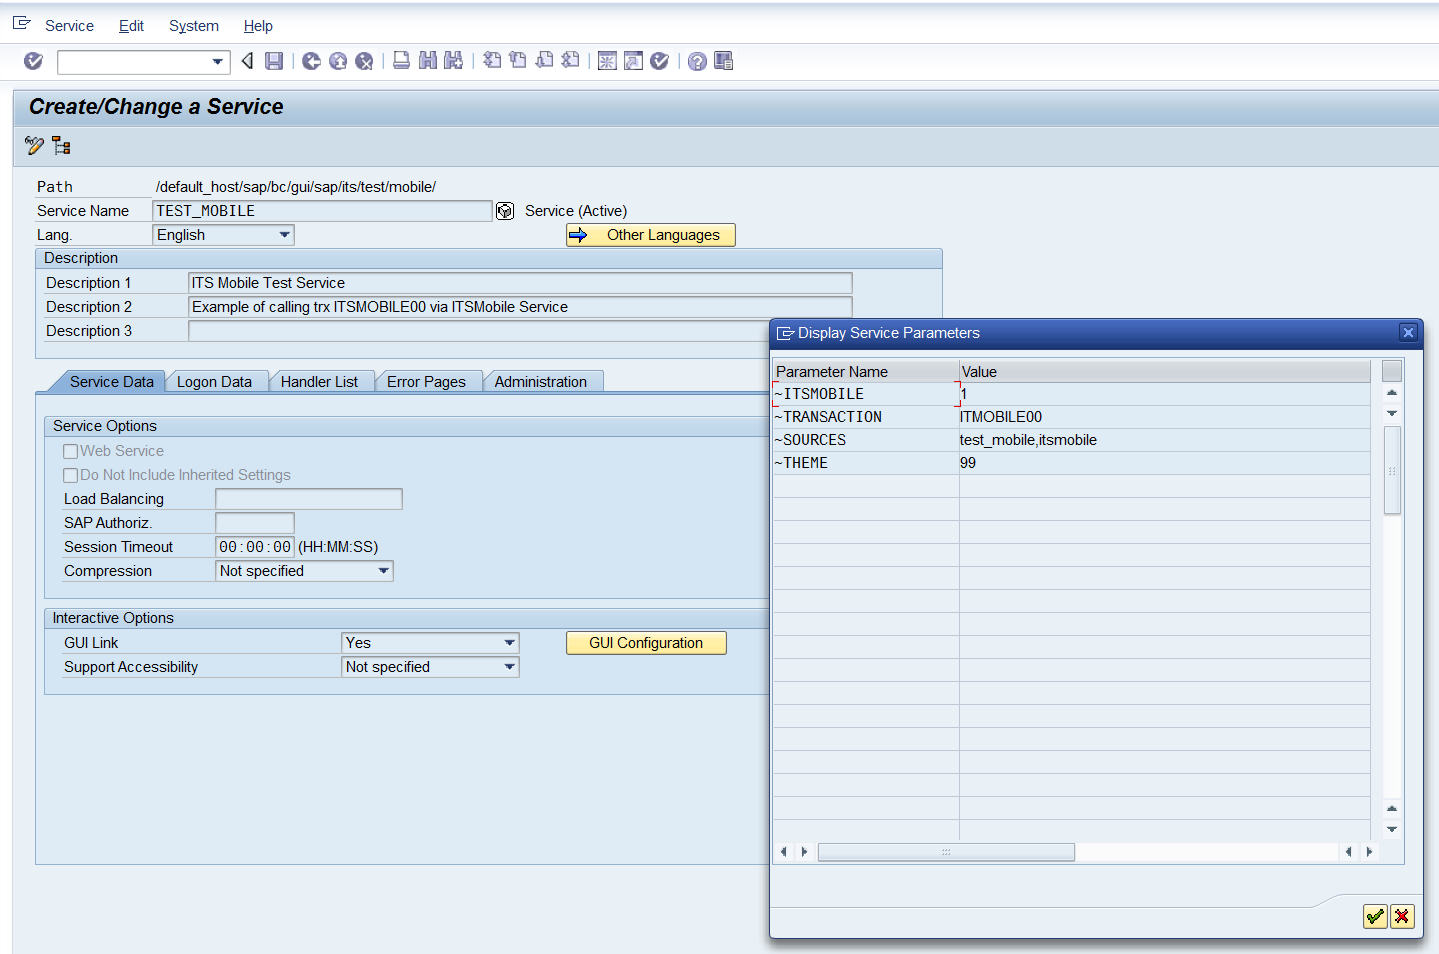 ITSmobile Visual Editor - Wiki - SCN Wiki